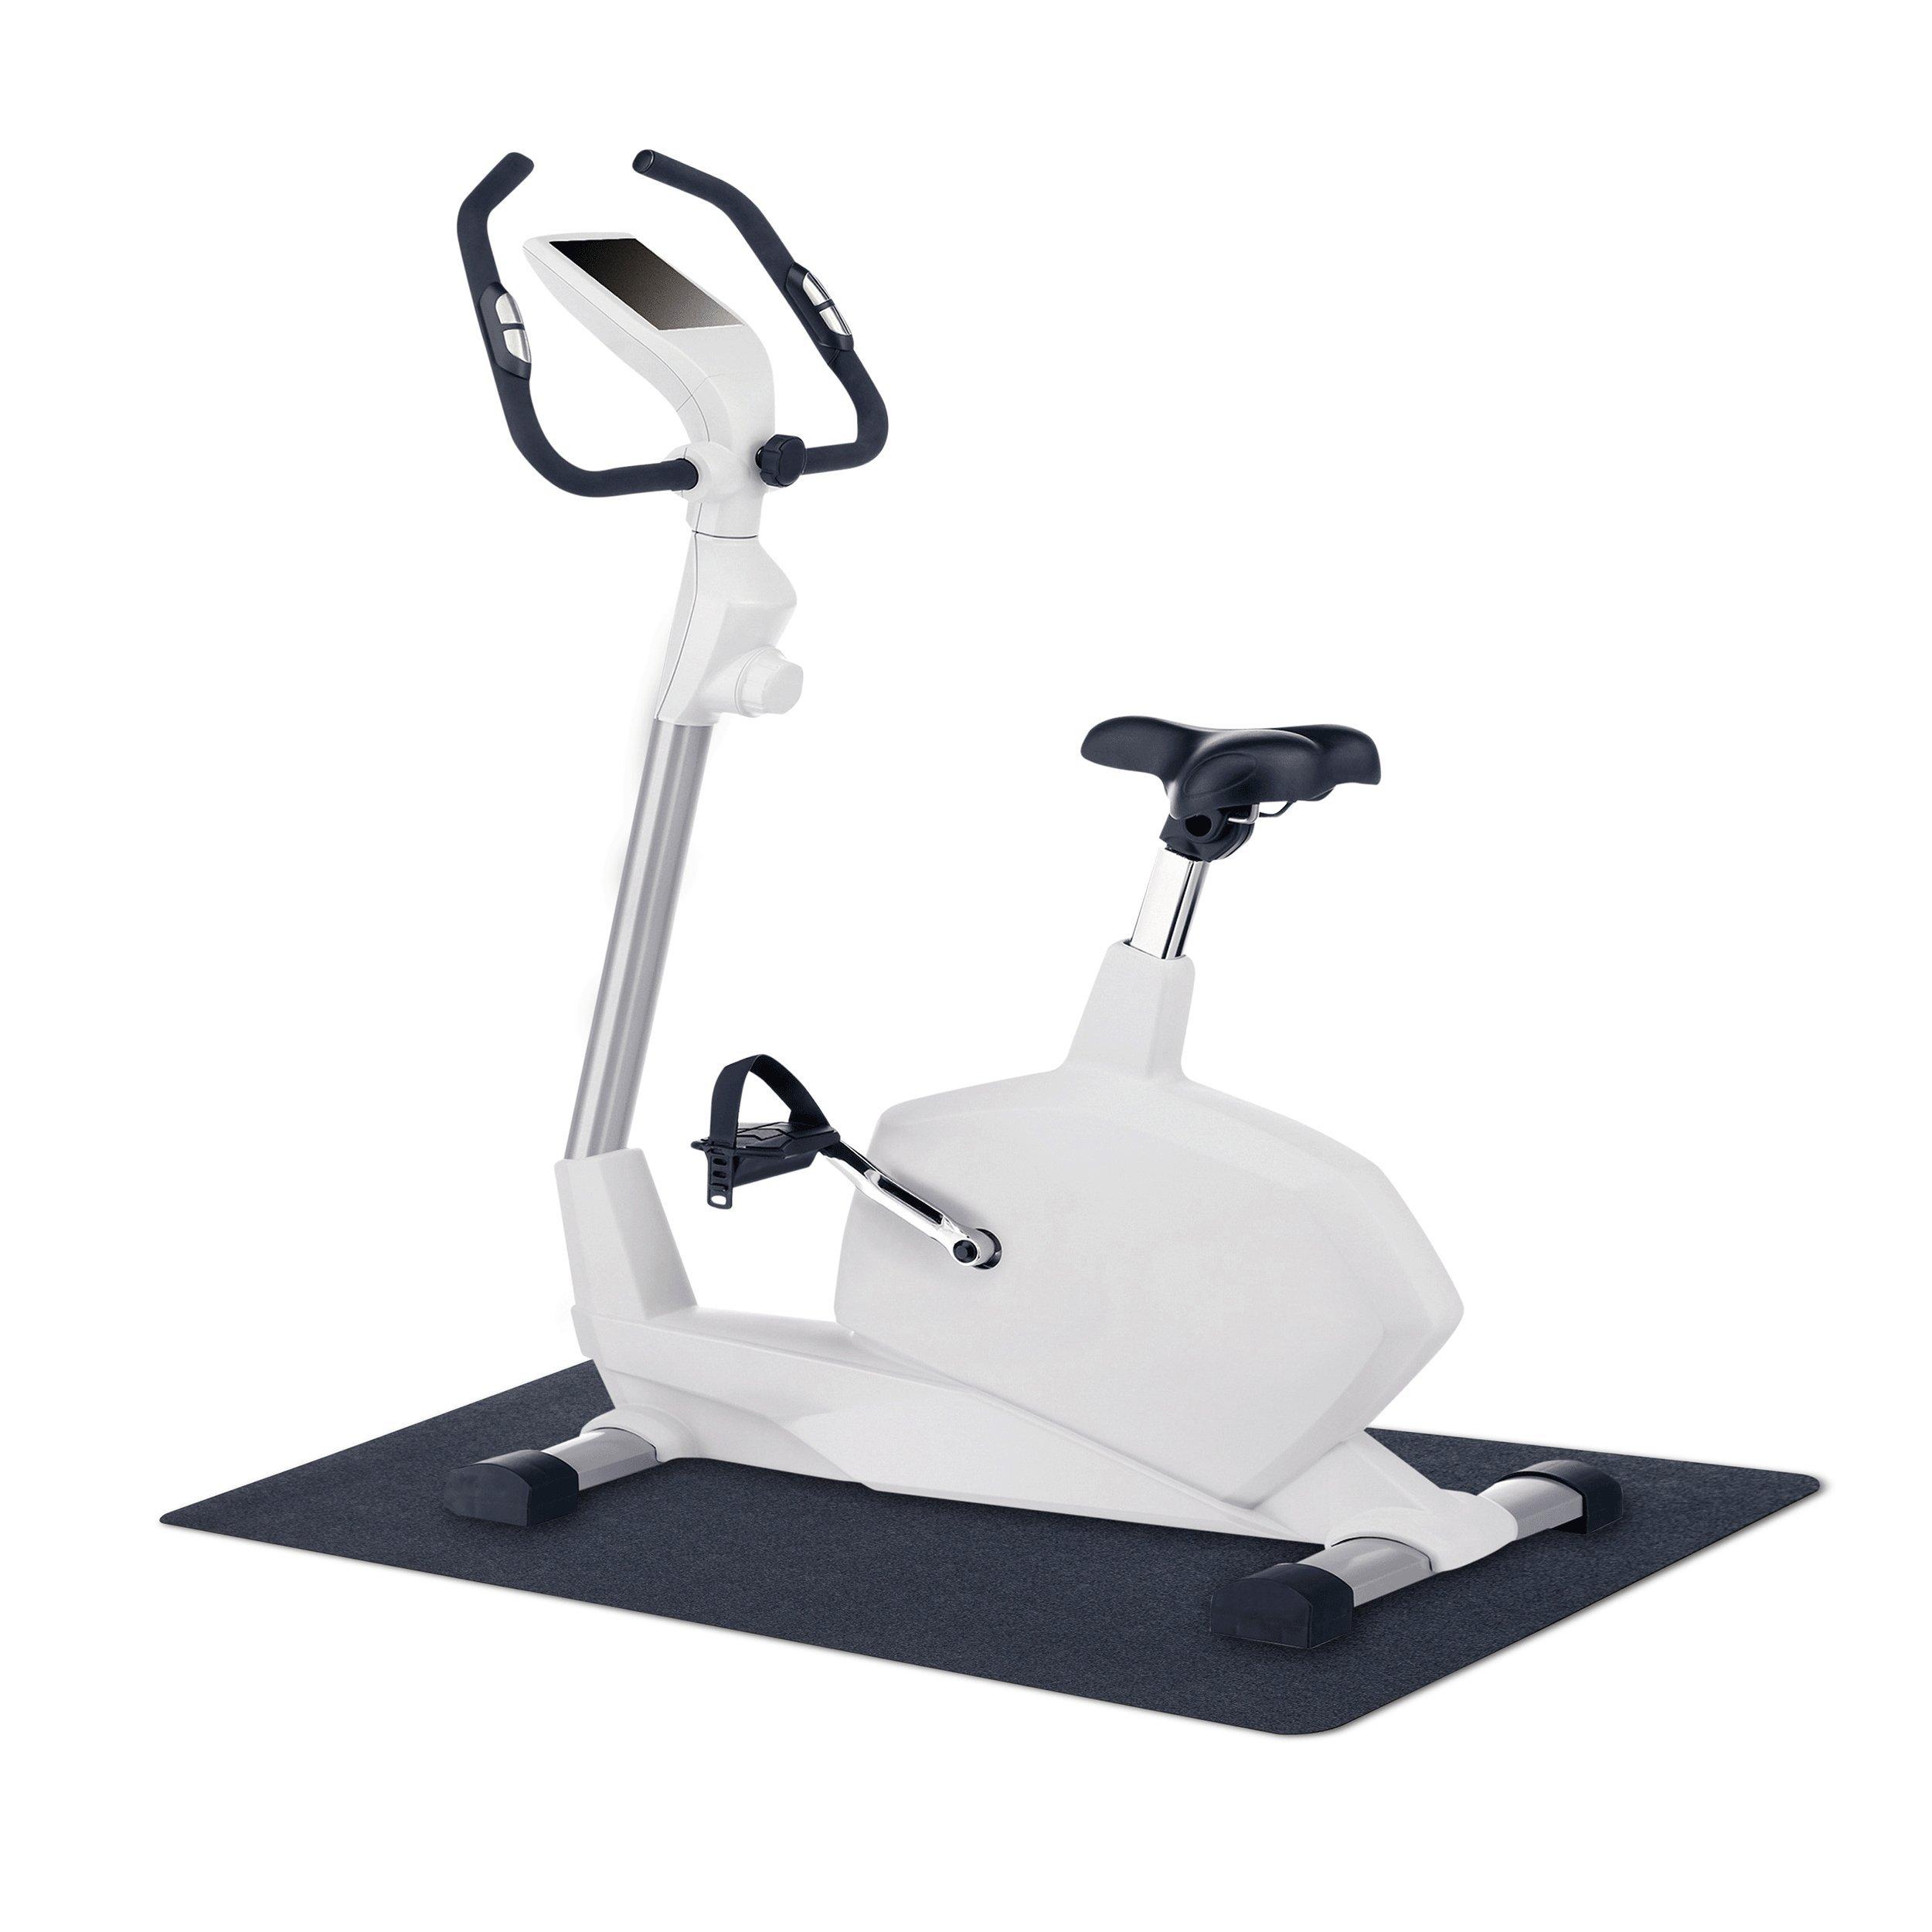 MotionTex 8M-110-24C-4 Fitness Equipment Mat, 24'' x 48'', Black